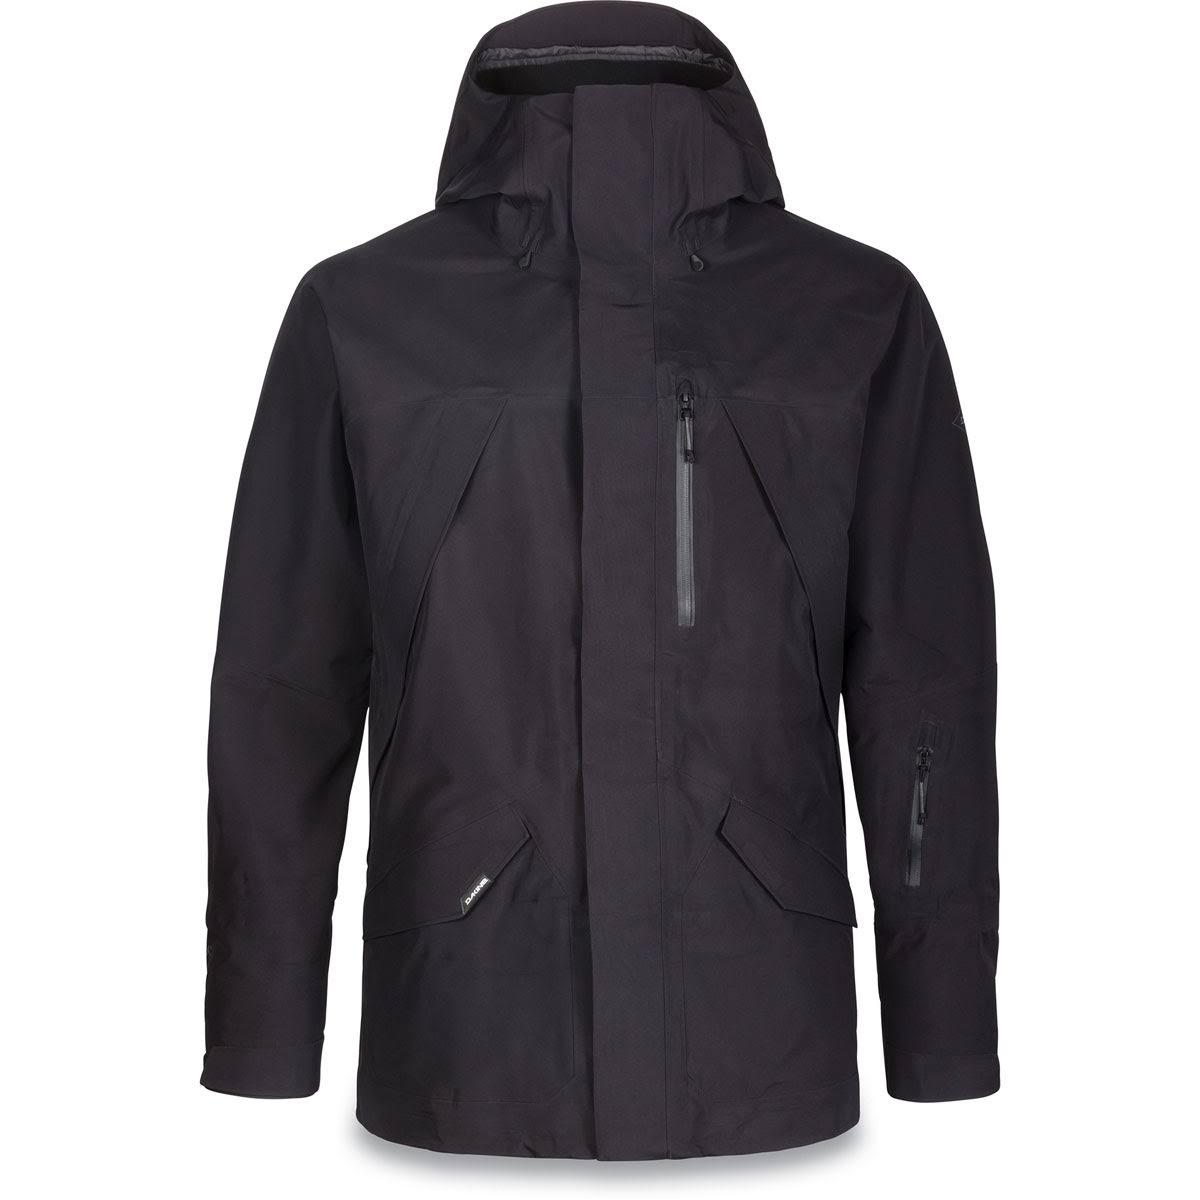 Jacket Negro Sawtooth Negro 3l L Hombre Dakine PpRxv1n